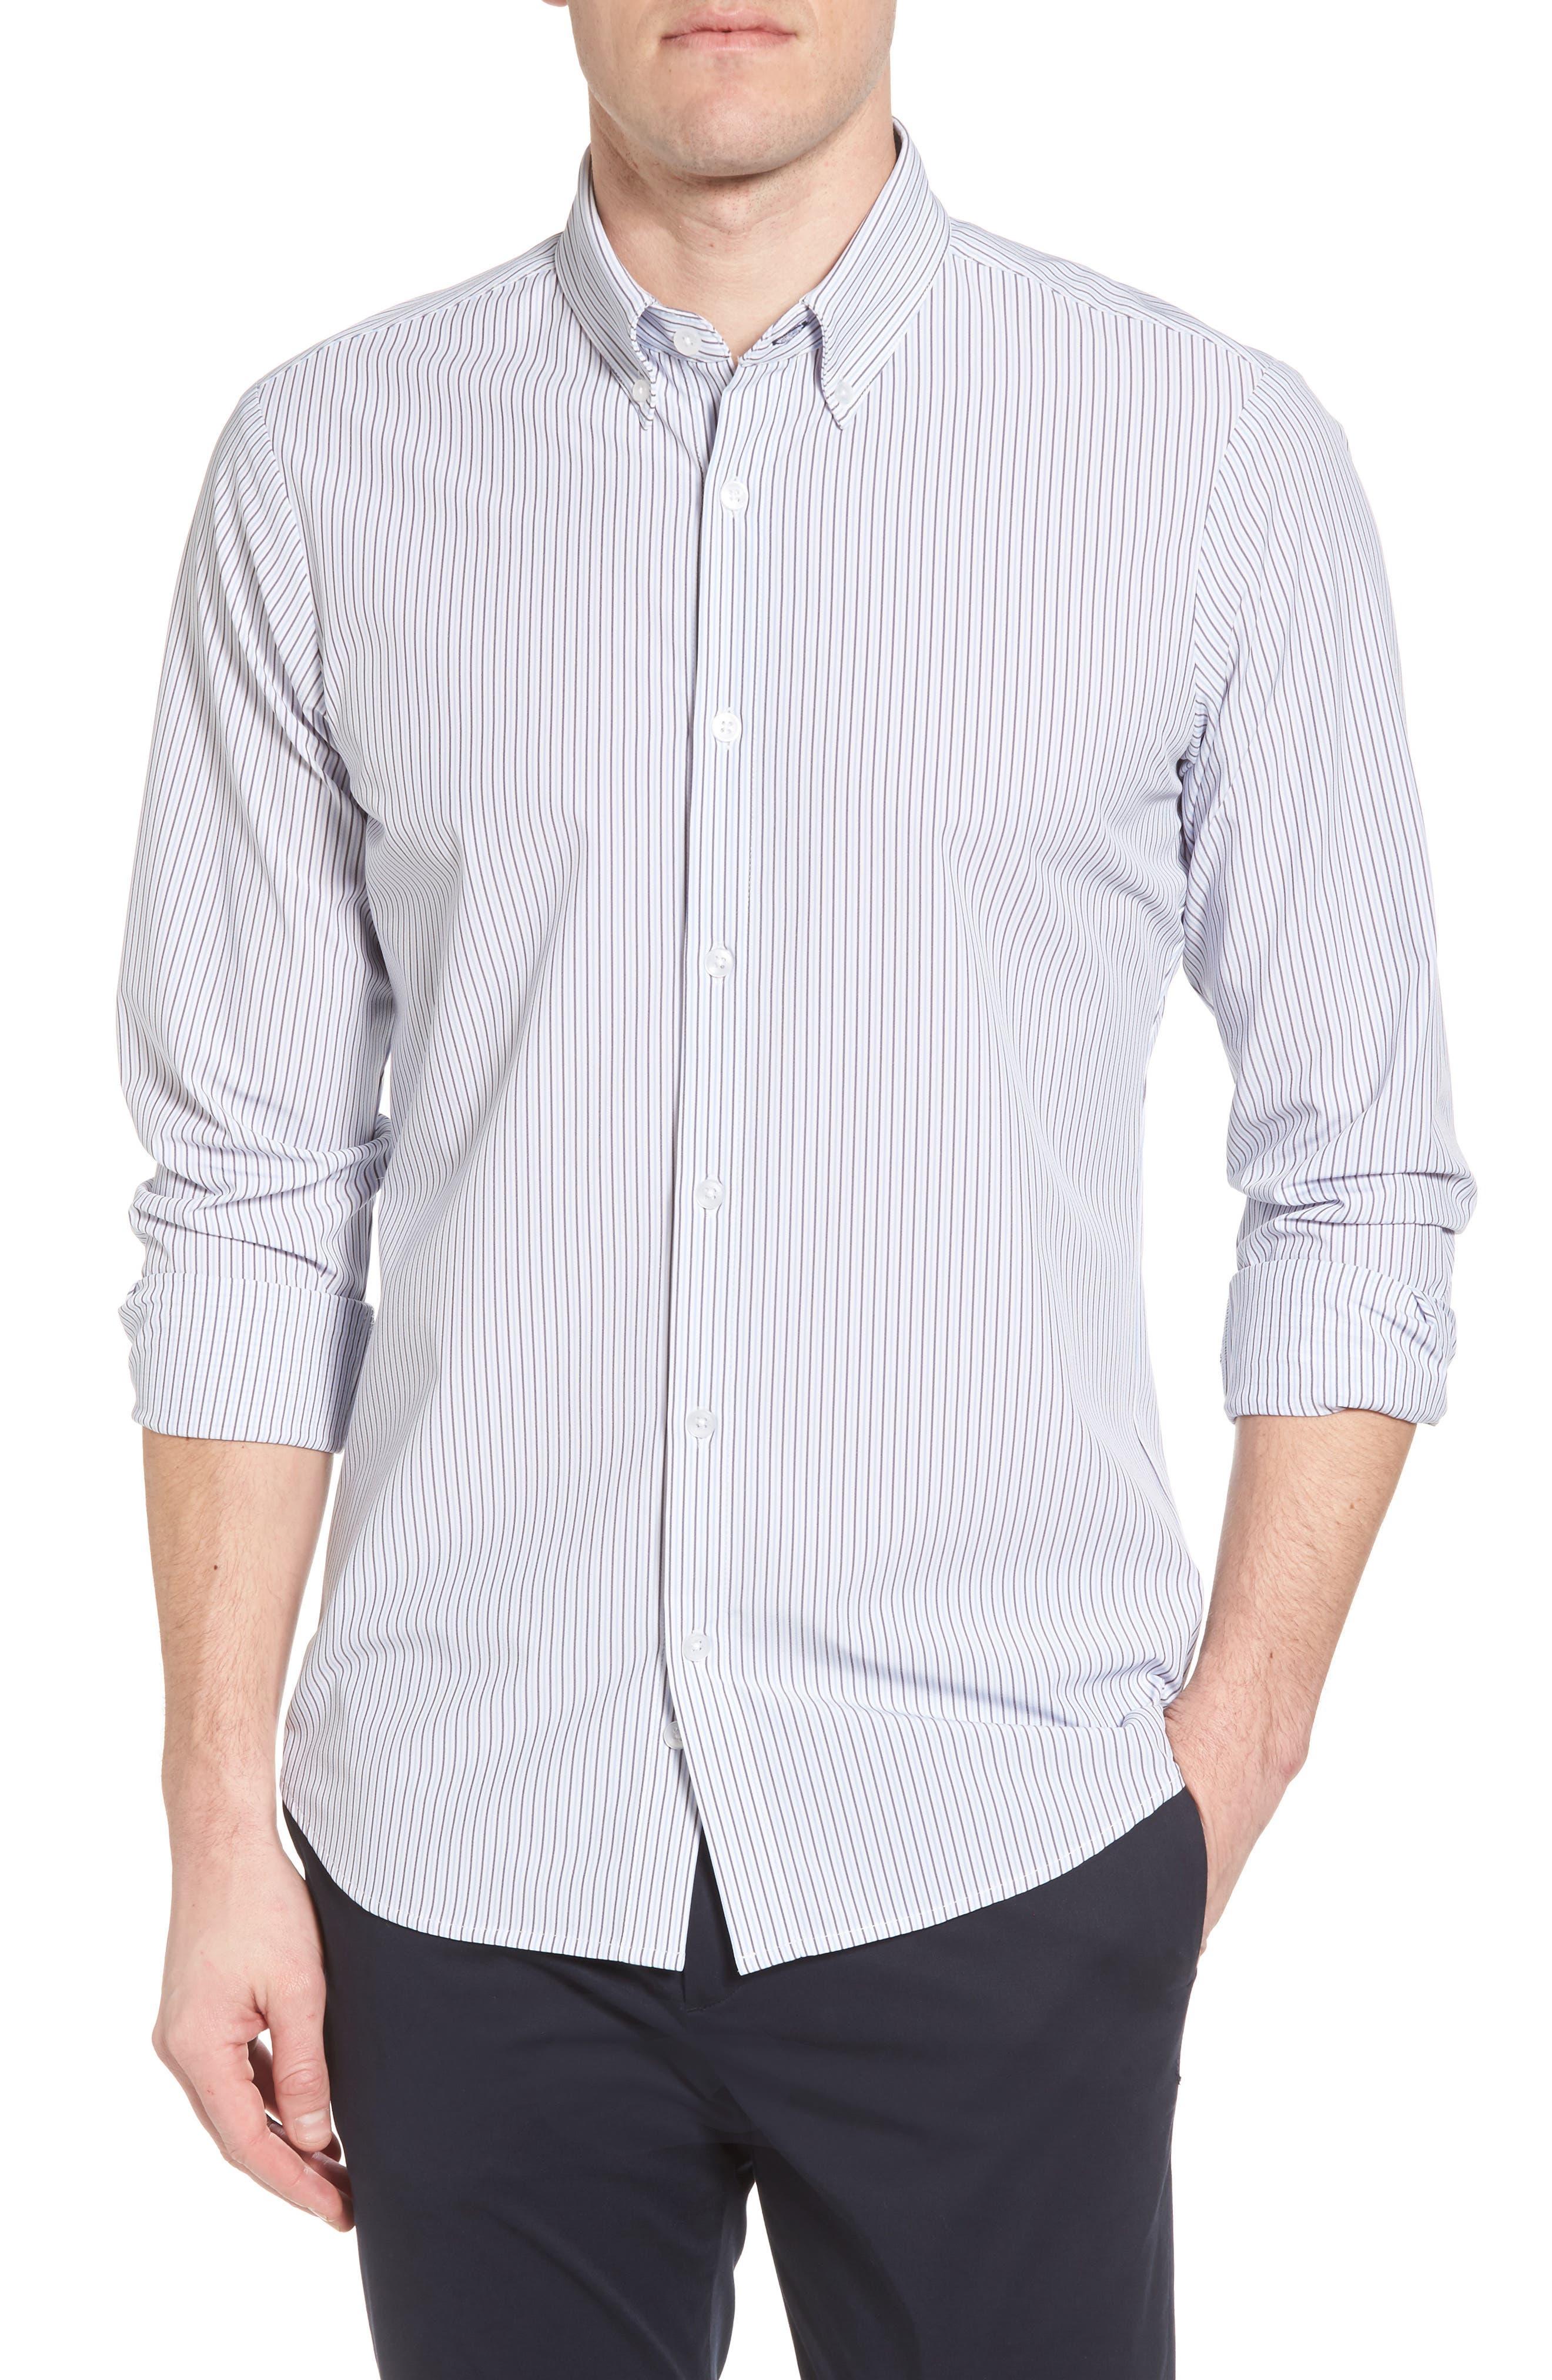 Callahan Stripe Sport Shirt,                         Main,                         color, 477